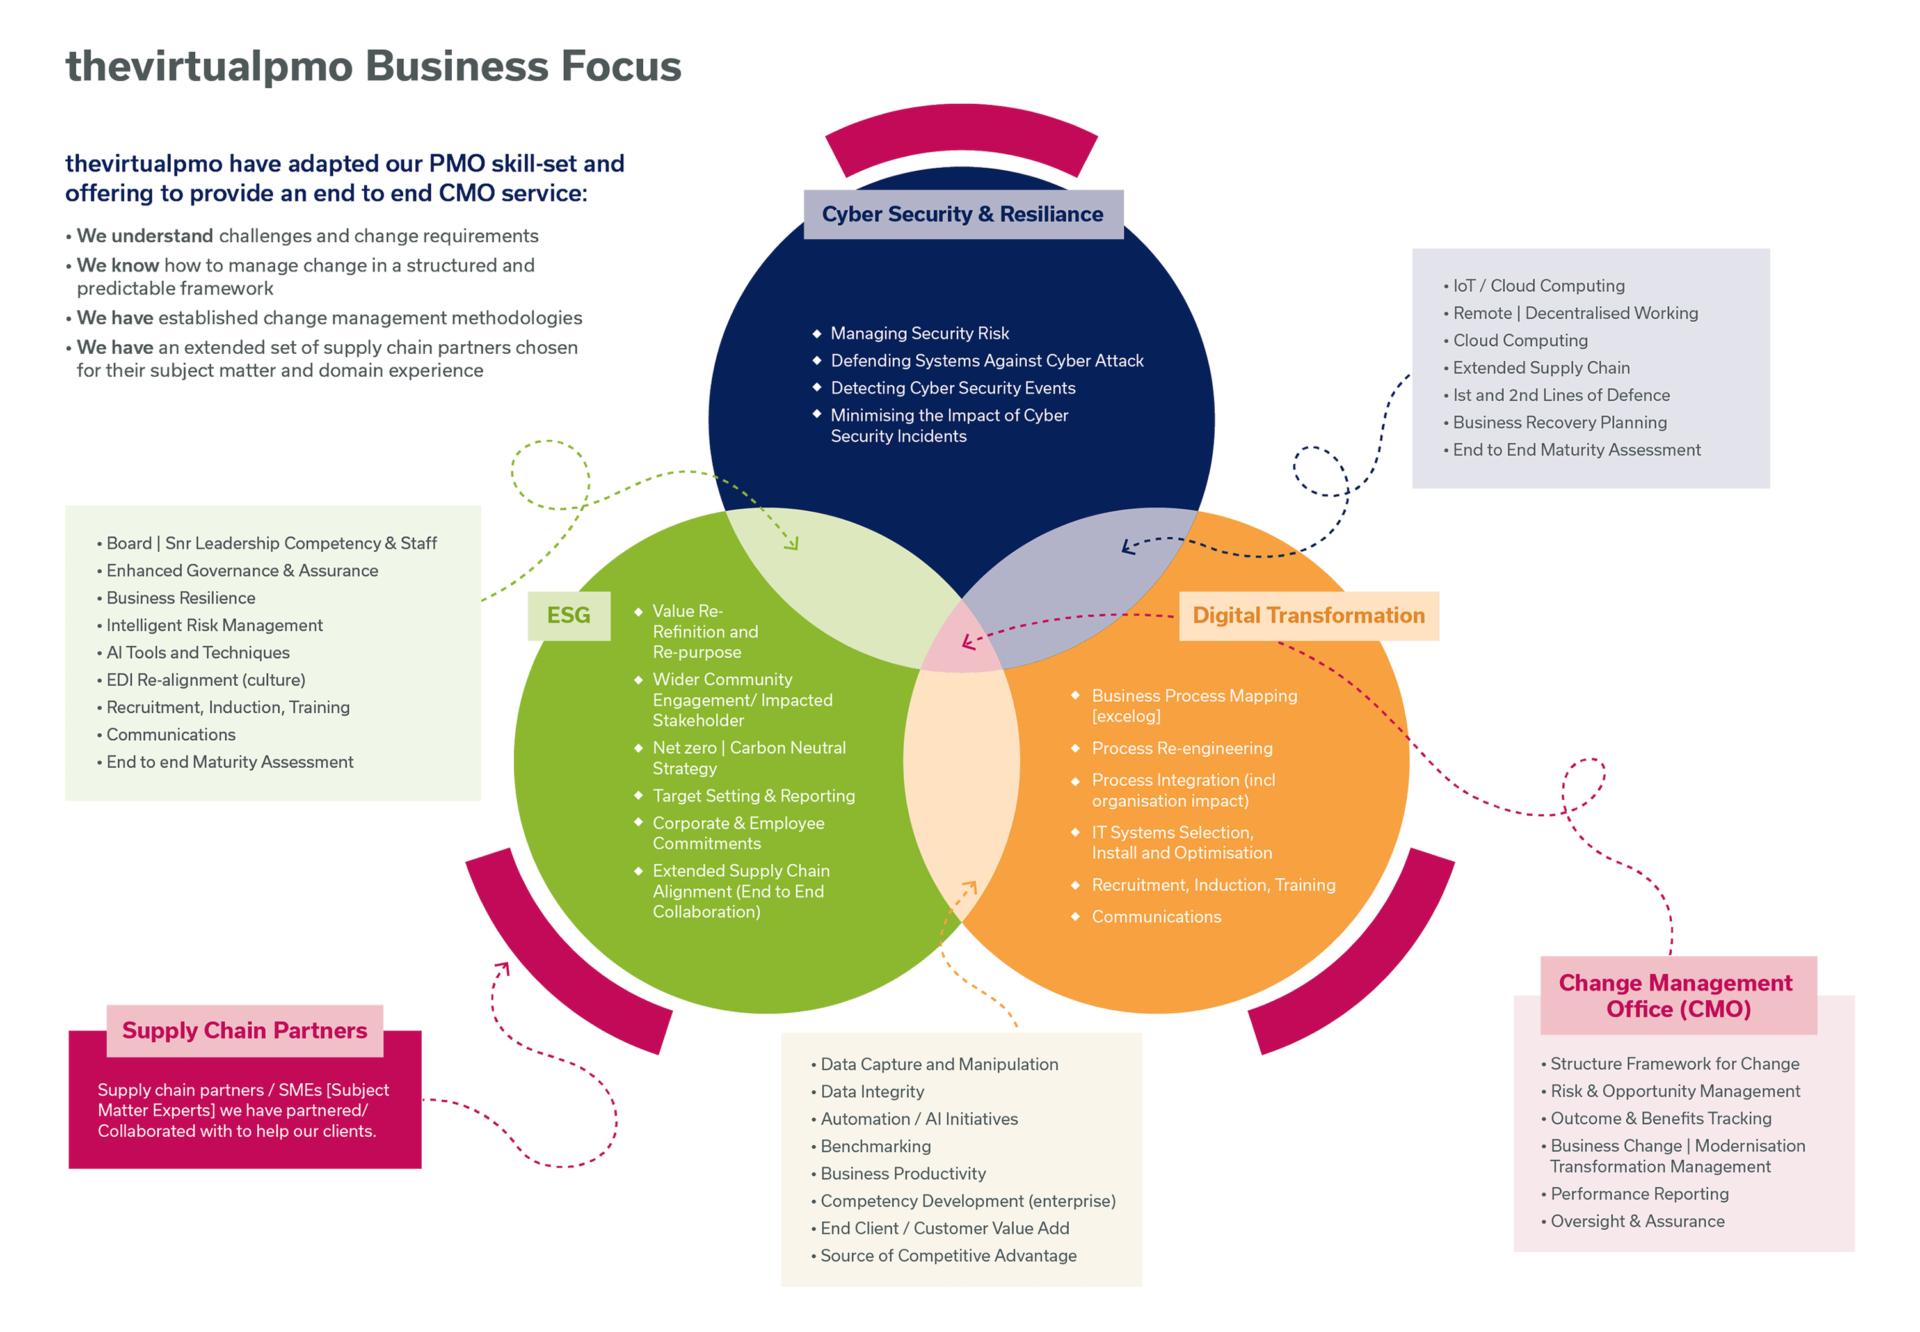 thevirtualpmo Business Focus